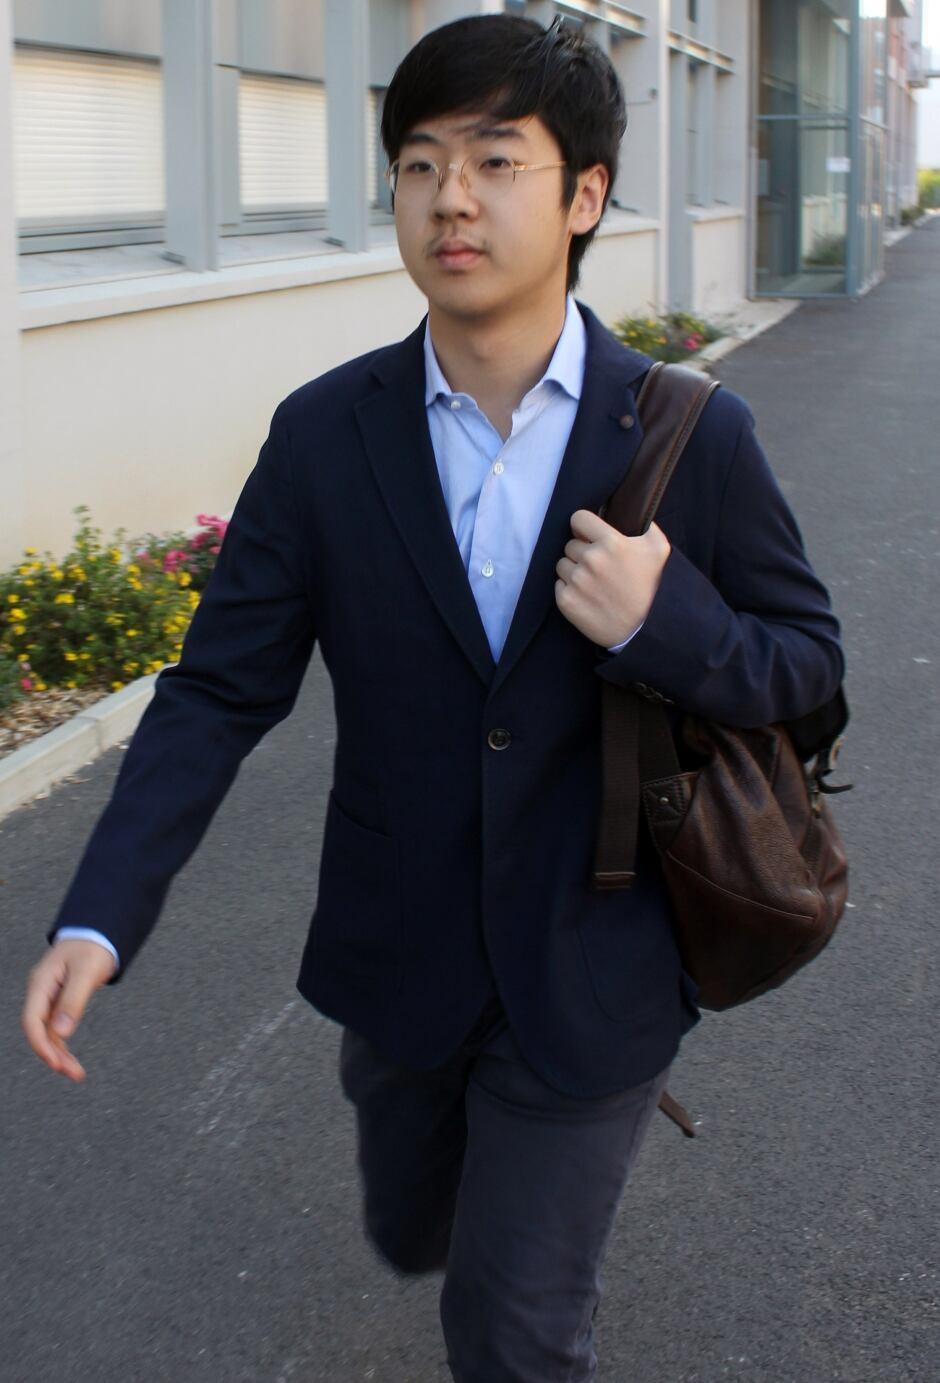 Kim Han-sol, son of Kim Jong-nam